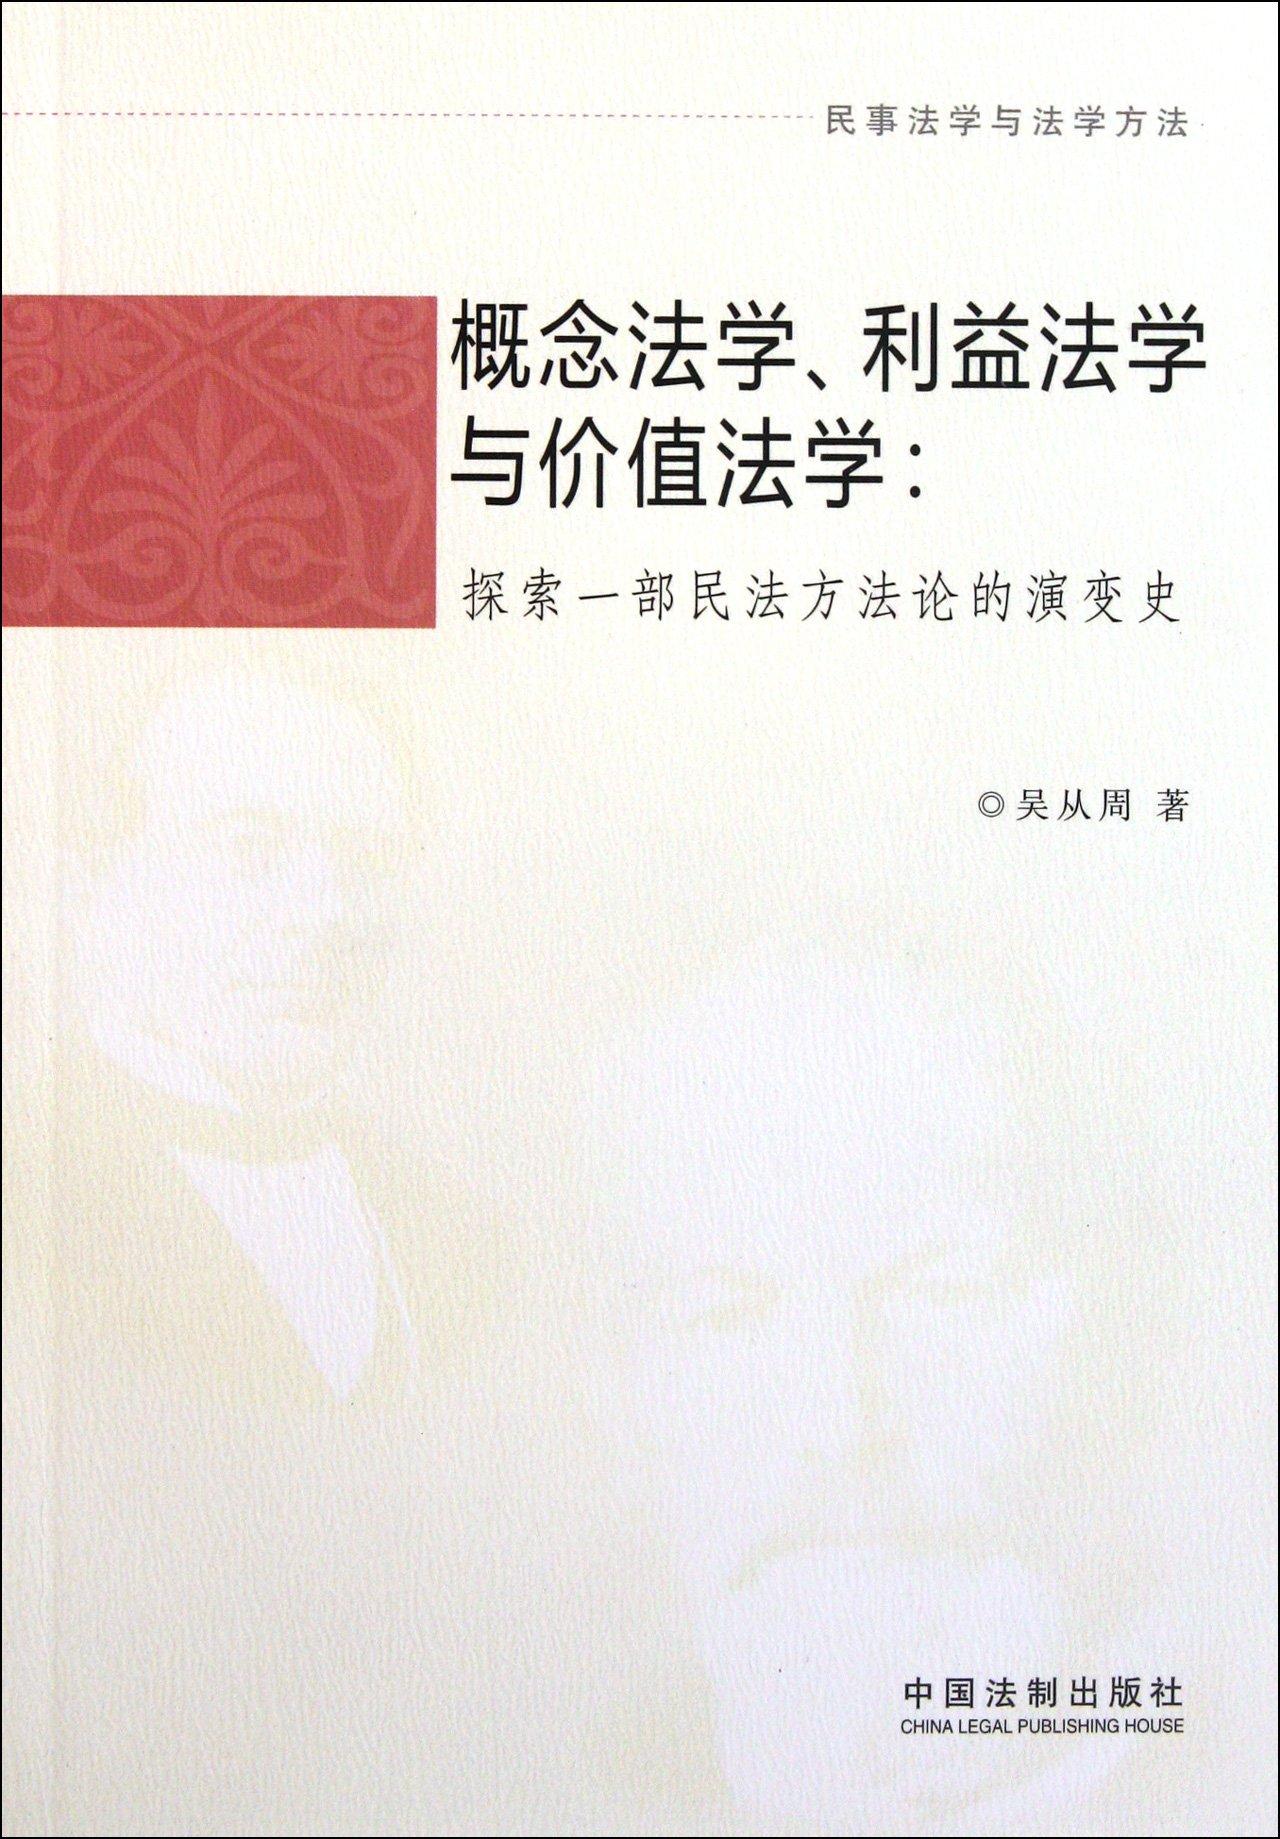 Download Conceptual jurisprudence, interest jurisprudence and value jurisprudence: to explore the history of civil law methodology (Chinese Edition) pdf epub